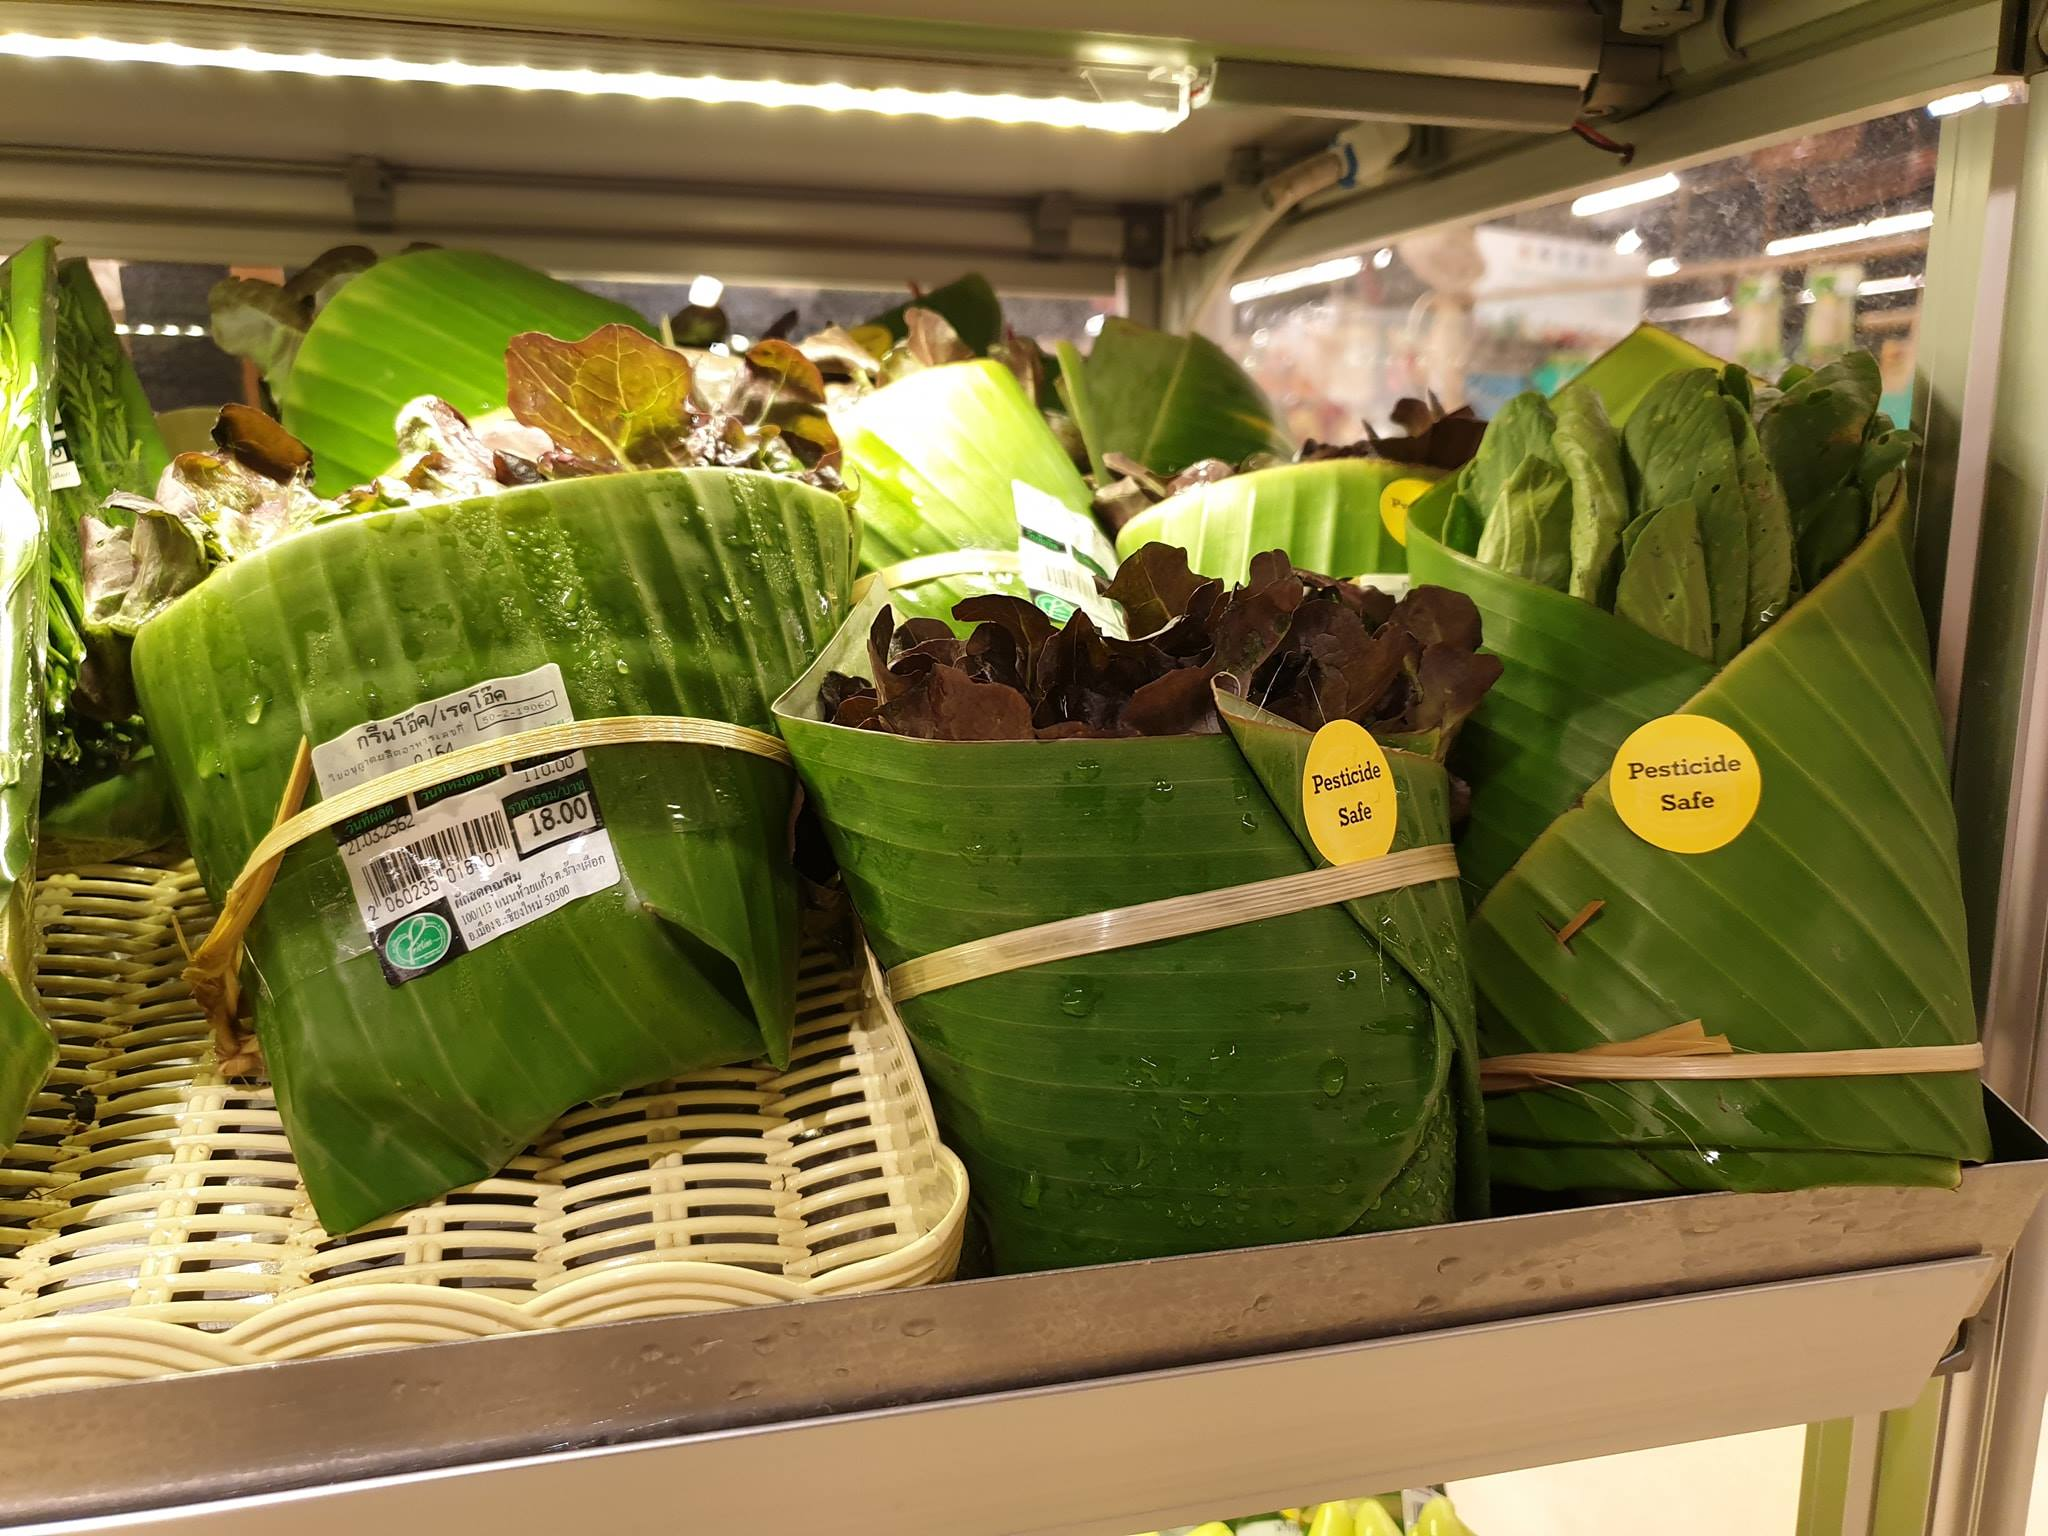 foglie banano packaging plastica